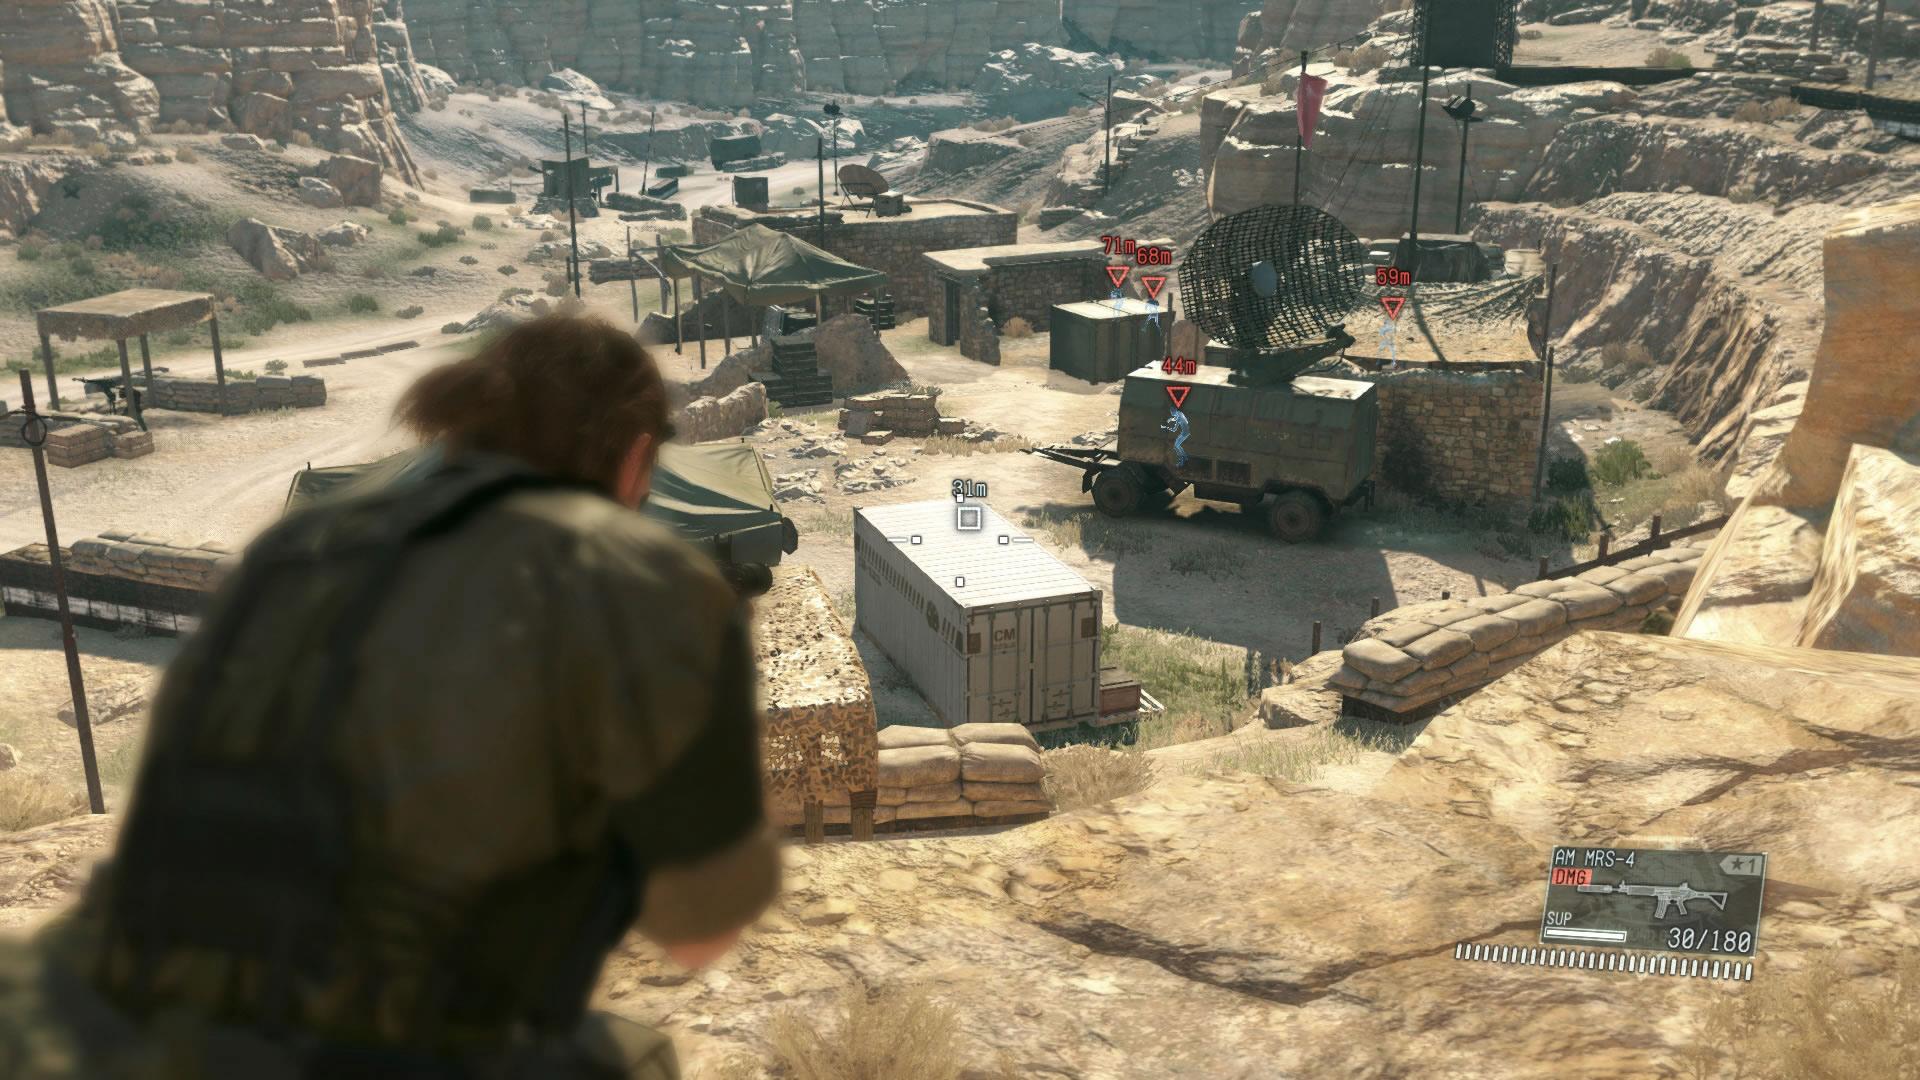 Metal-Gear-Solid-V-The-Phantom-Pain-Screenshot-8